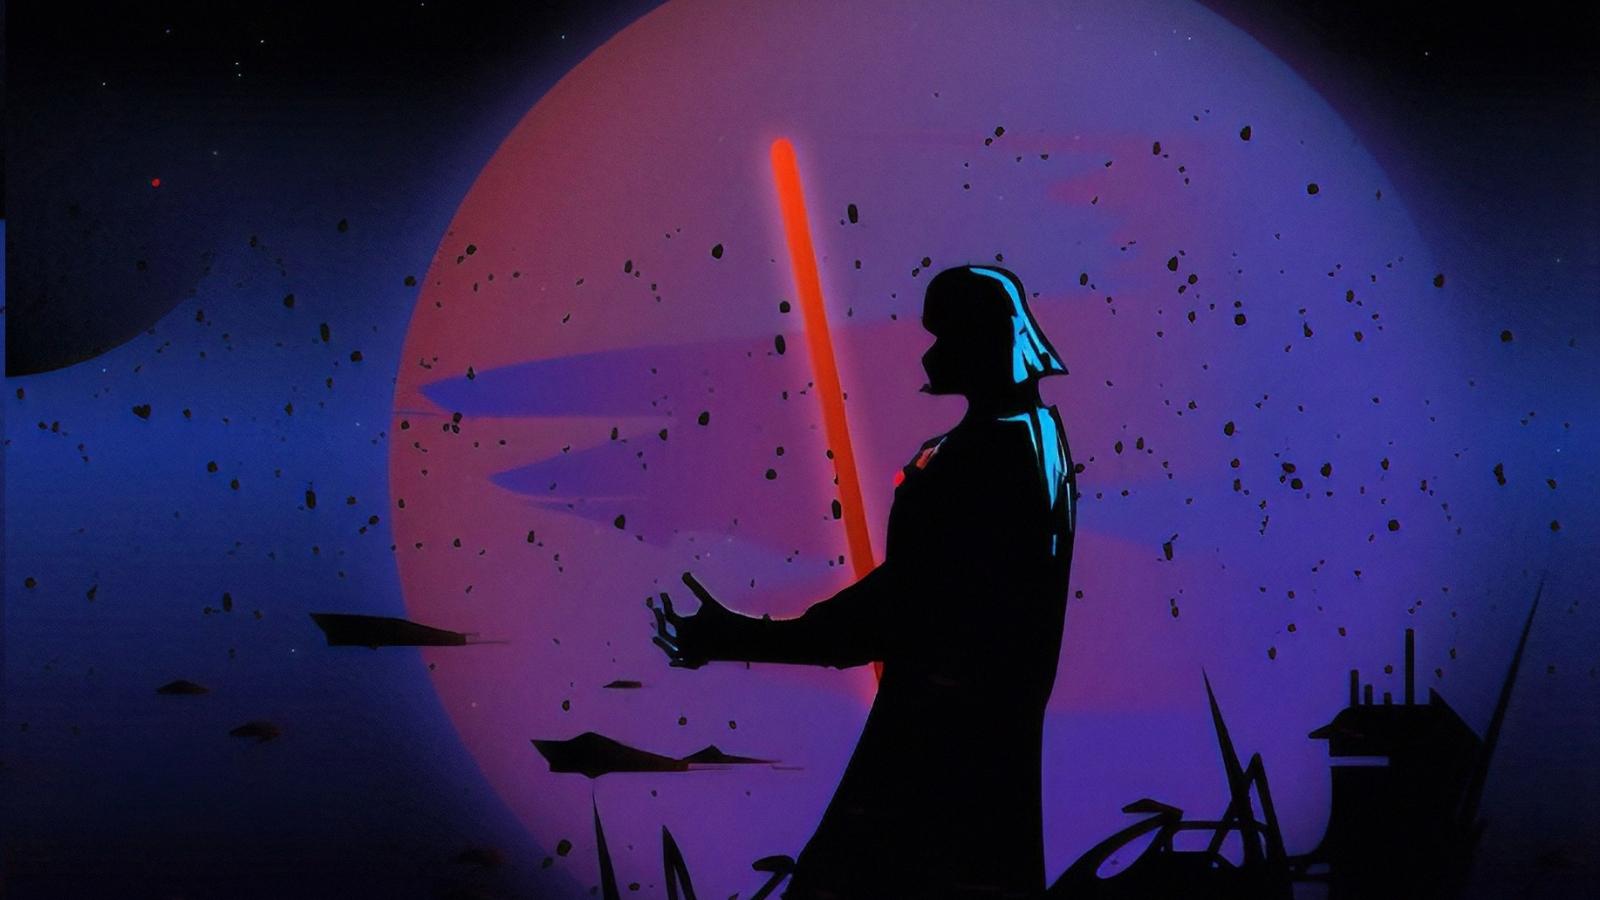 Download 1600x900 Wallpaper Star Wars Darth Vader Digital Art Widescreen 16 9 Widescreen 1600x900 Hd Image Background 23055